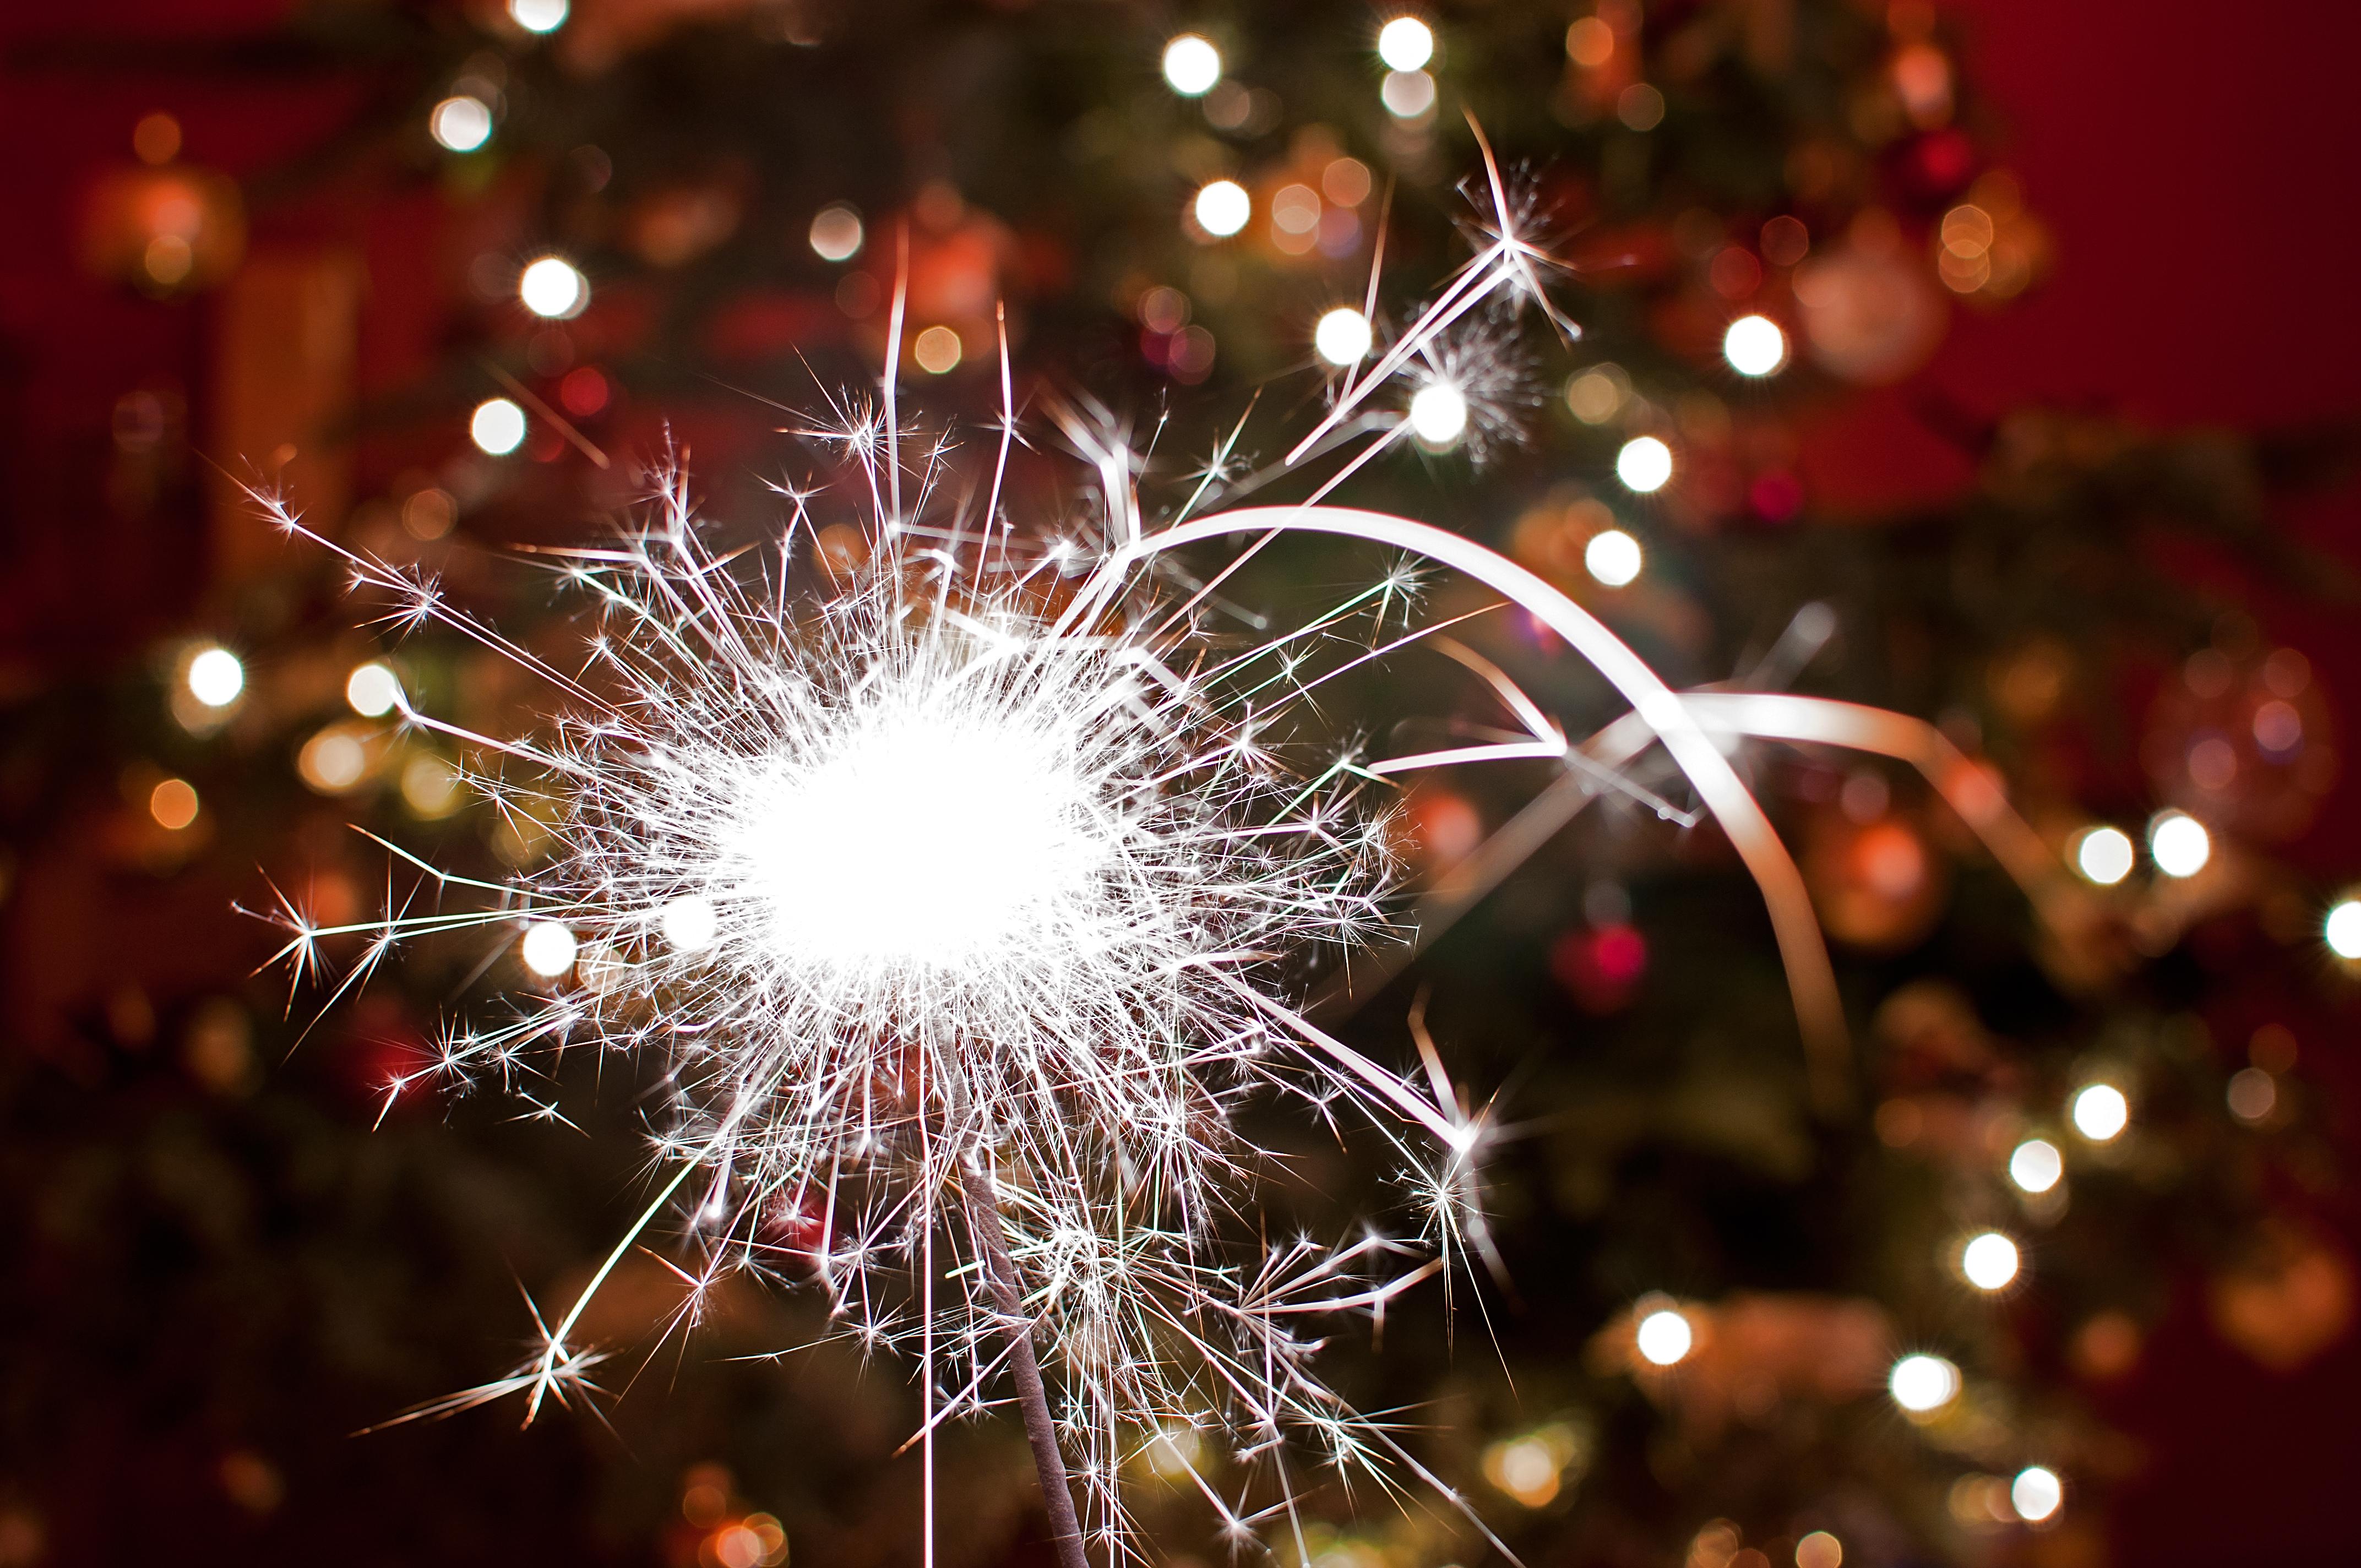 Shiny Christmas sparkler by PeterTakacs on DeviantArt